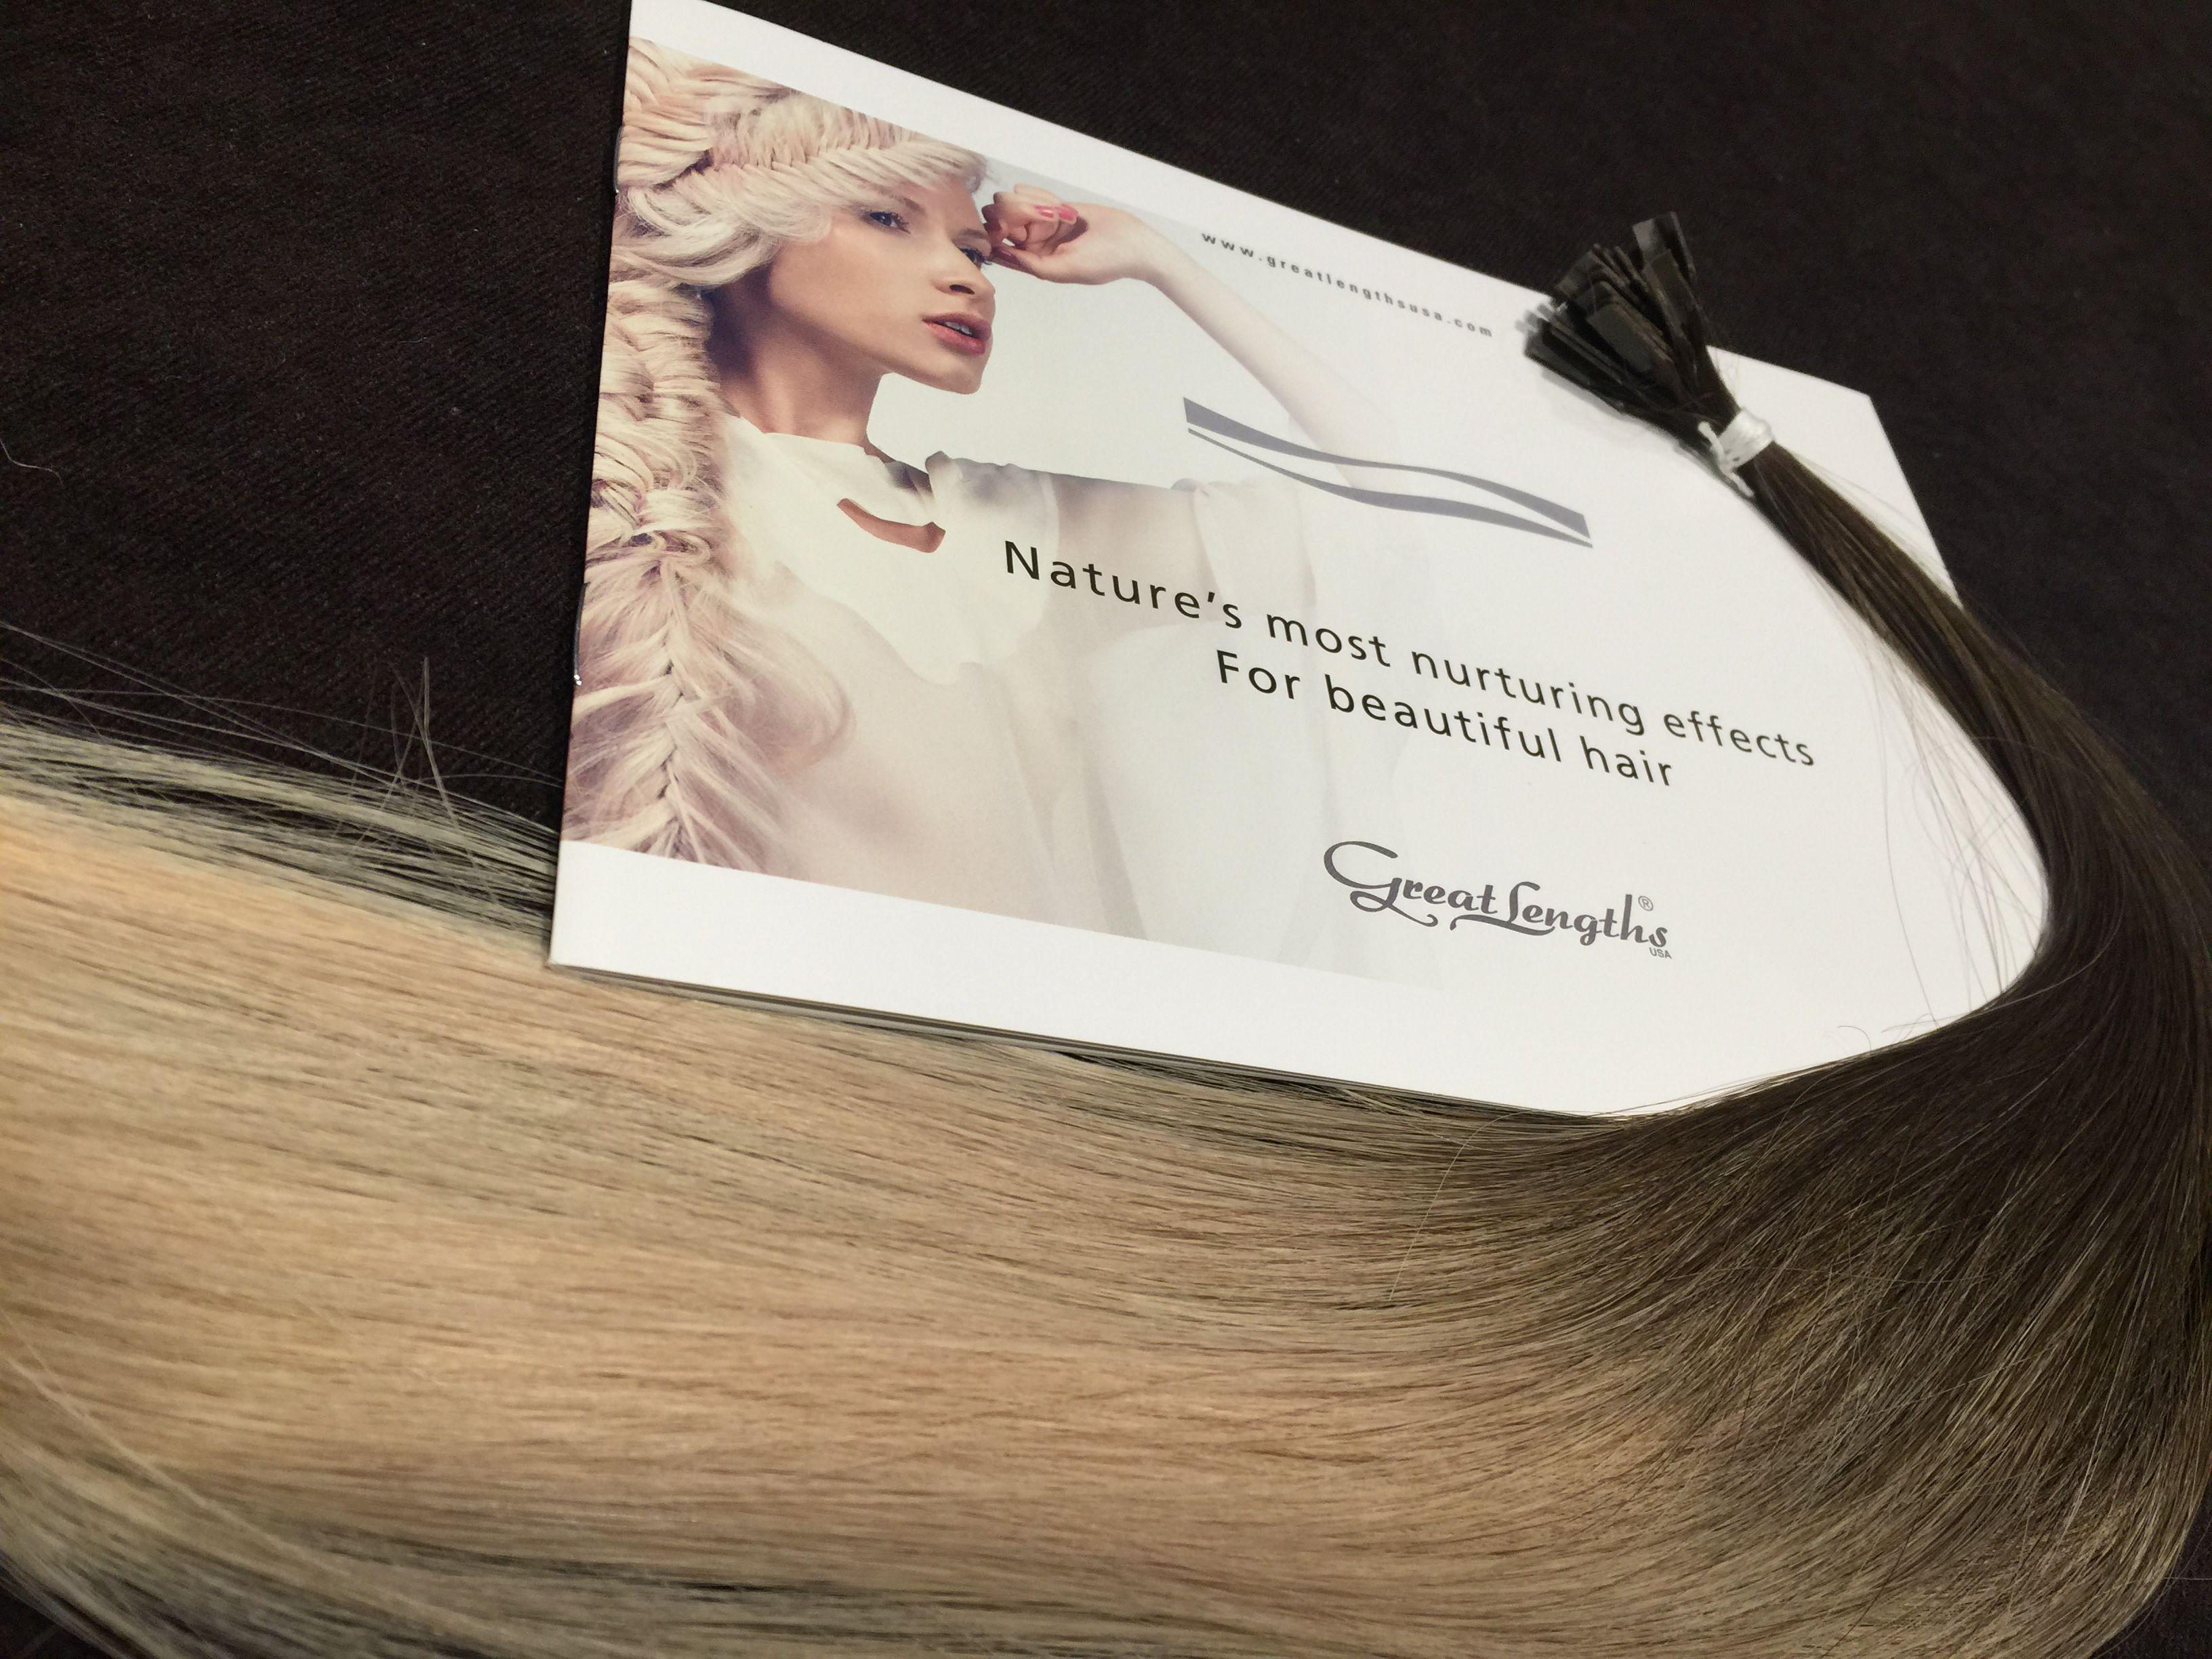 Garnish Hair Studio Extension Bar In Raleigh Receives Great